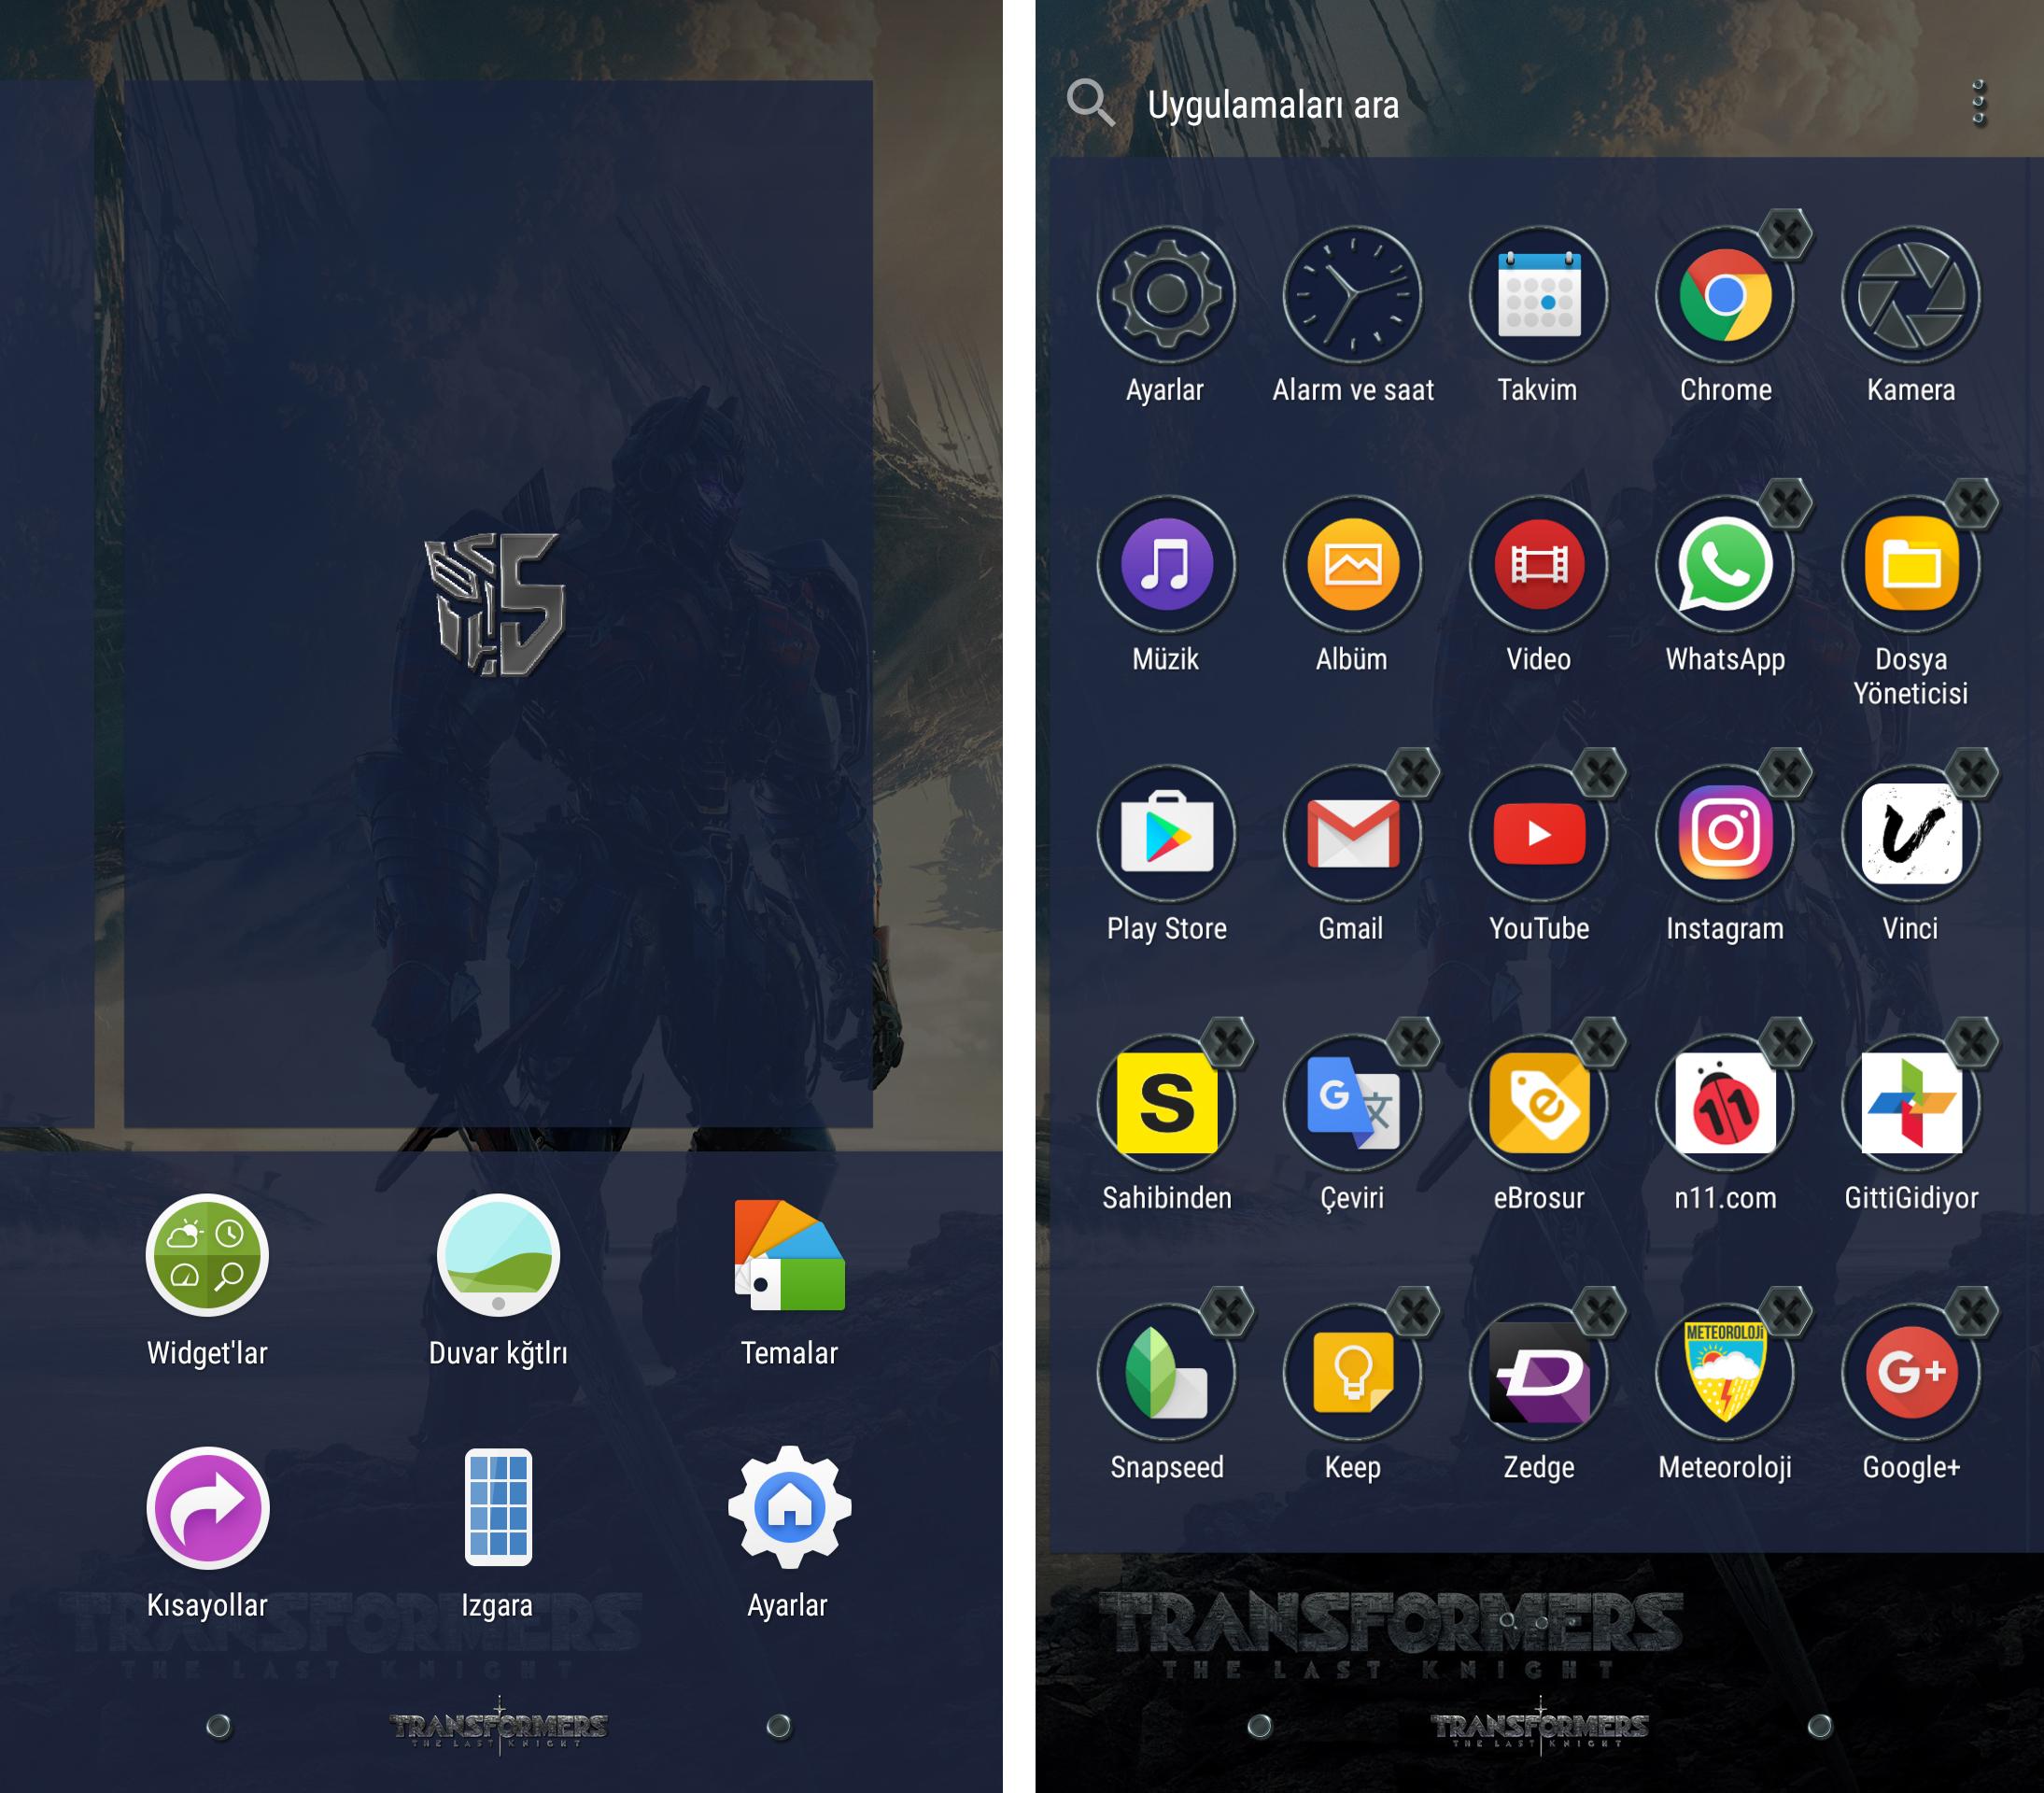 Gmail theme image size - Xperia Home Launcher Xperia Transformers Last Knight Theme